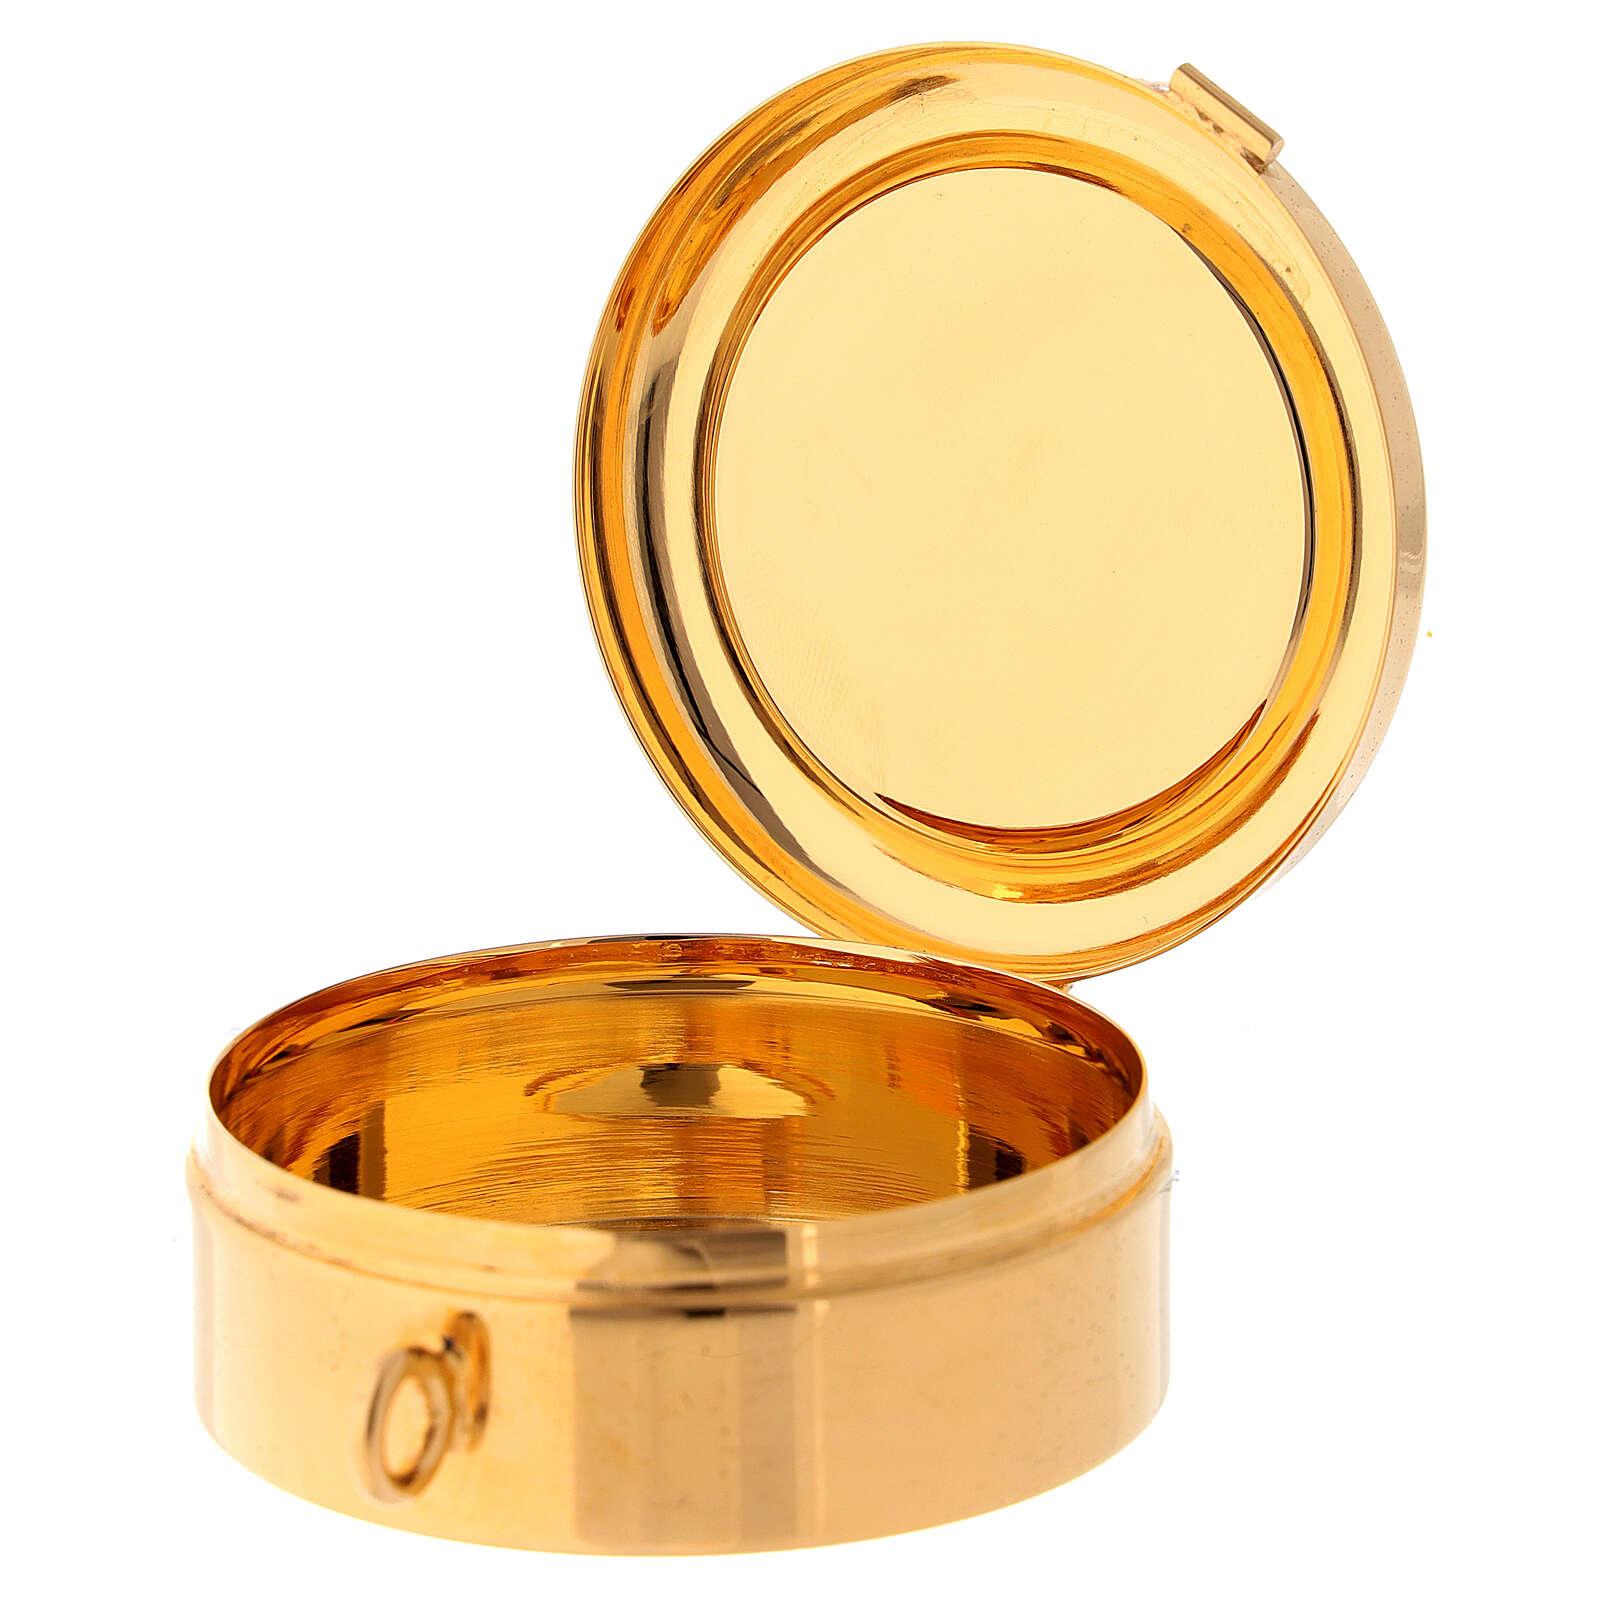 Relicario eucarístico placa esmaltada Cruz latón dorado 3